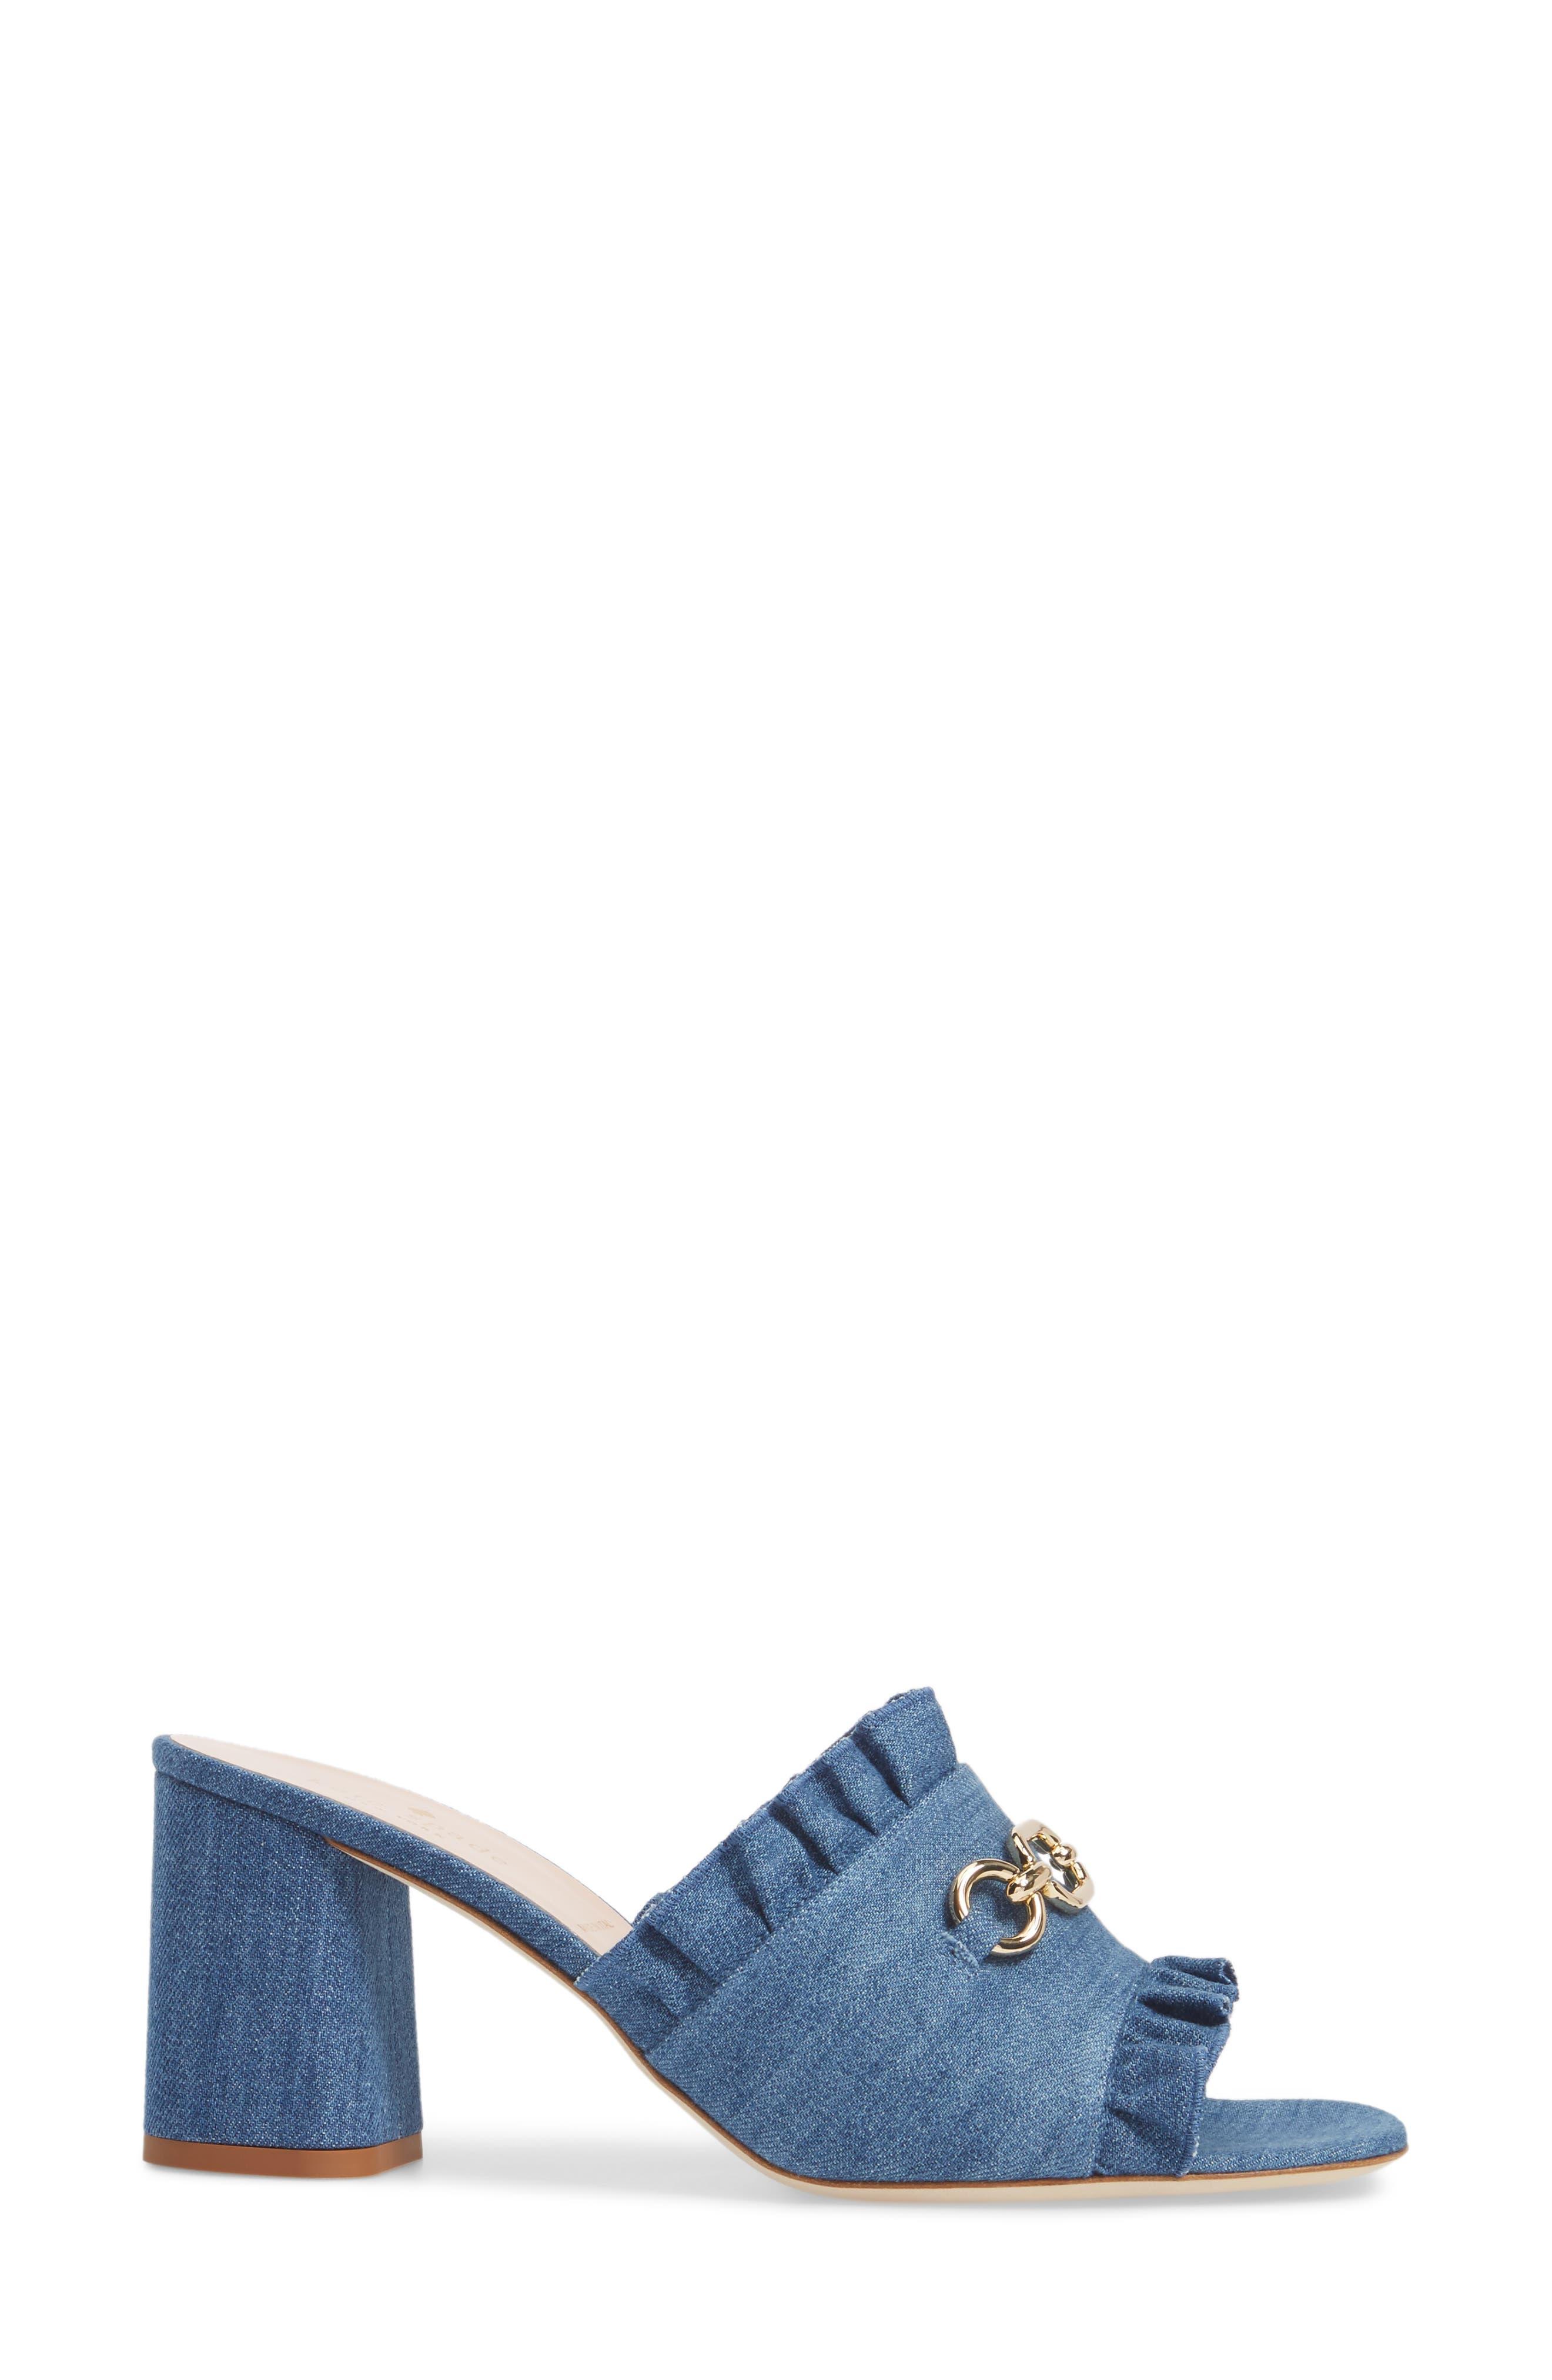 Alternate Image 3  - kate spade new york demmi sandal (Women)